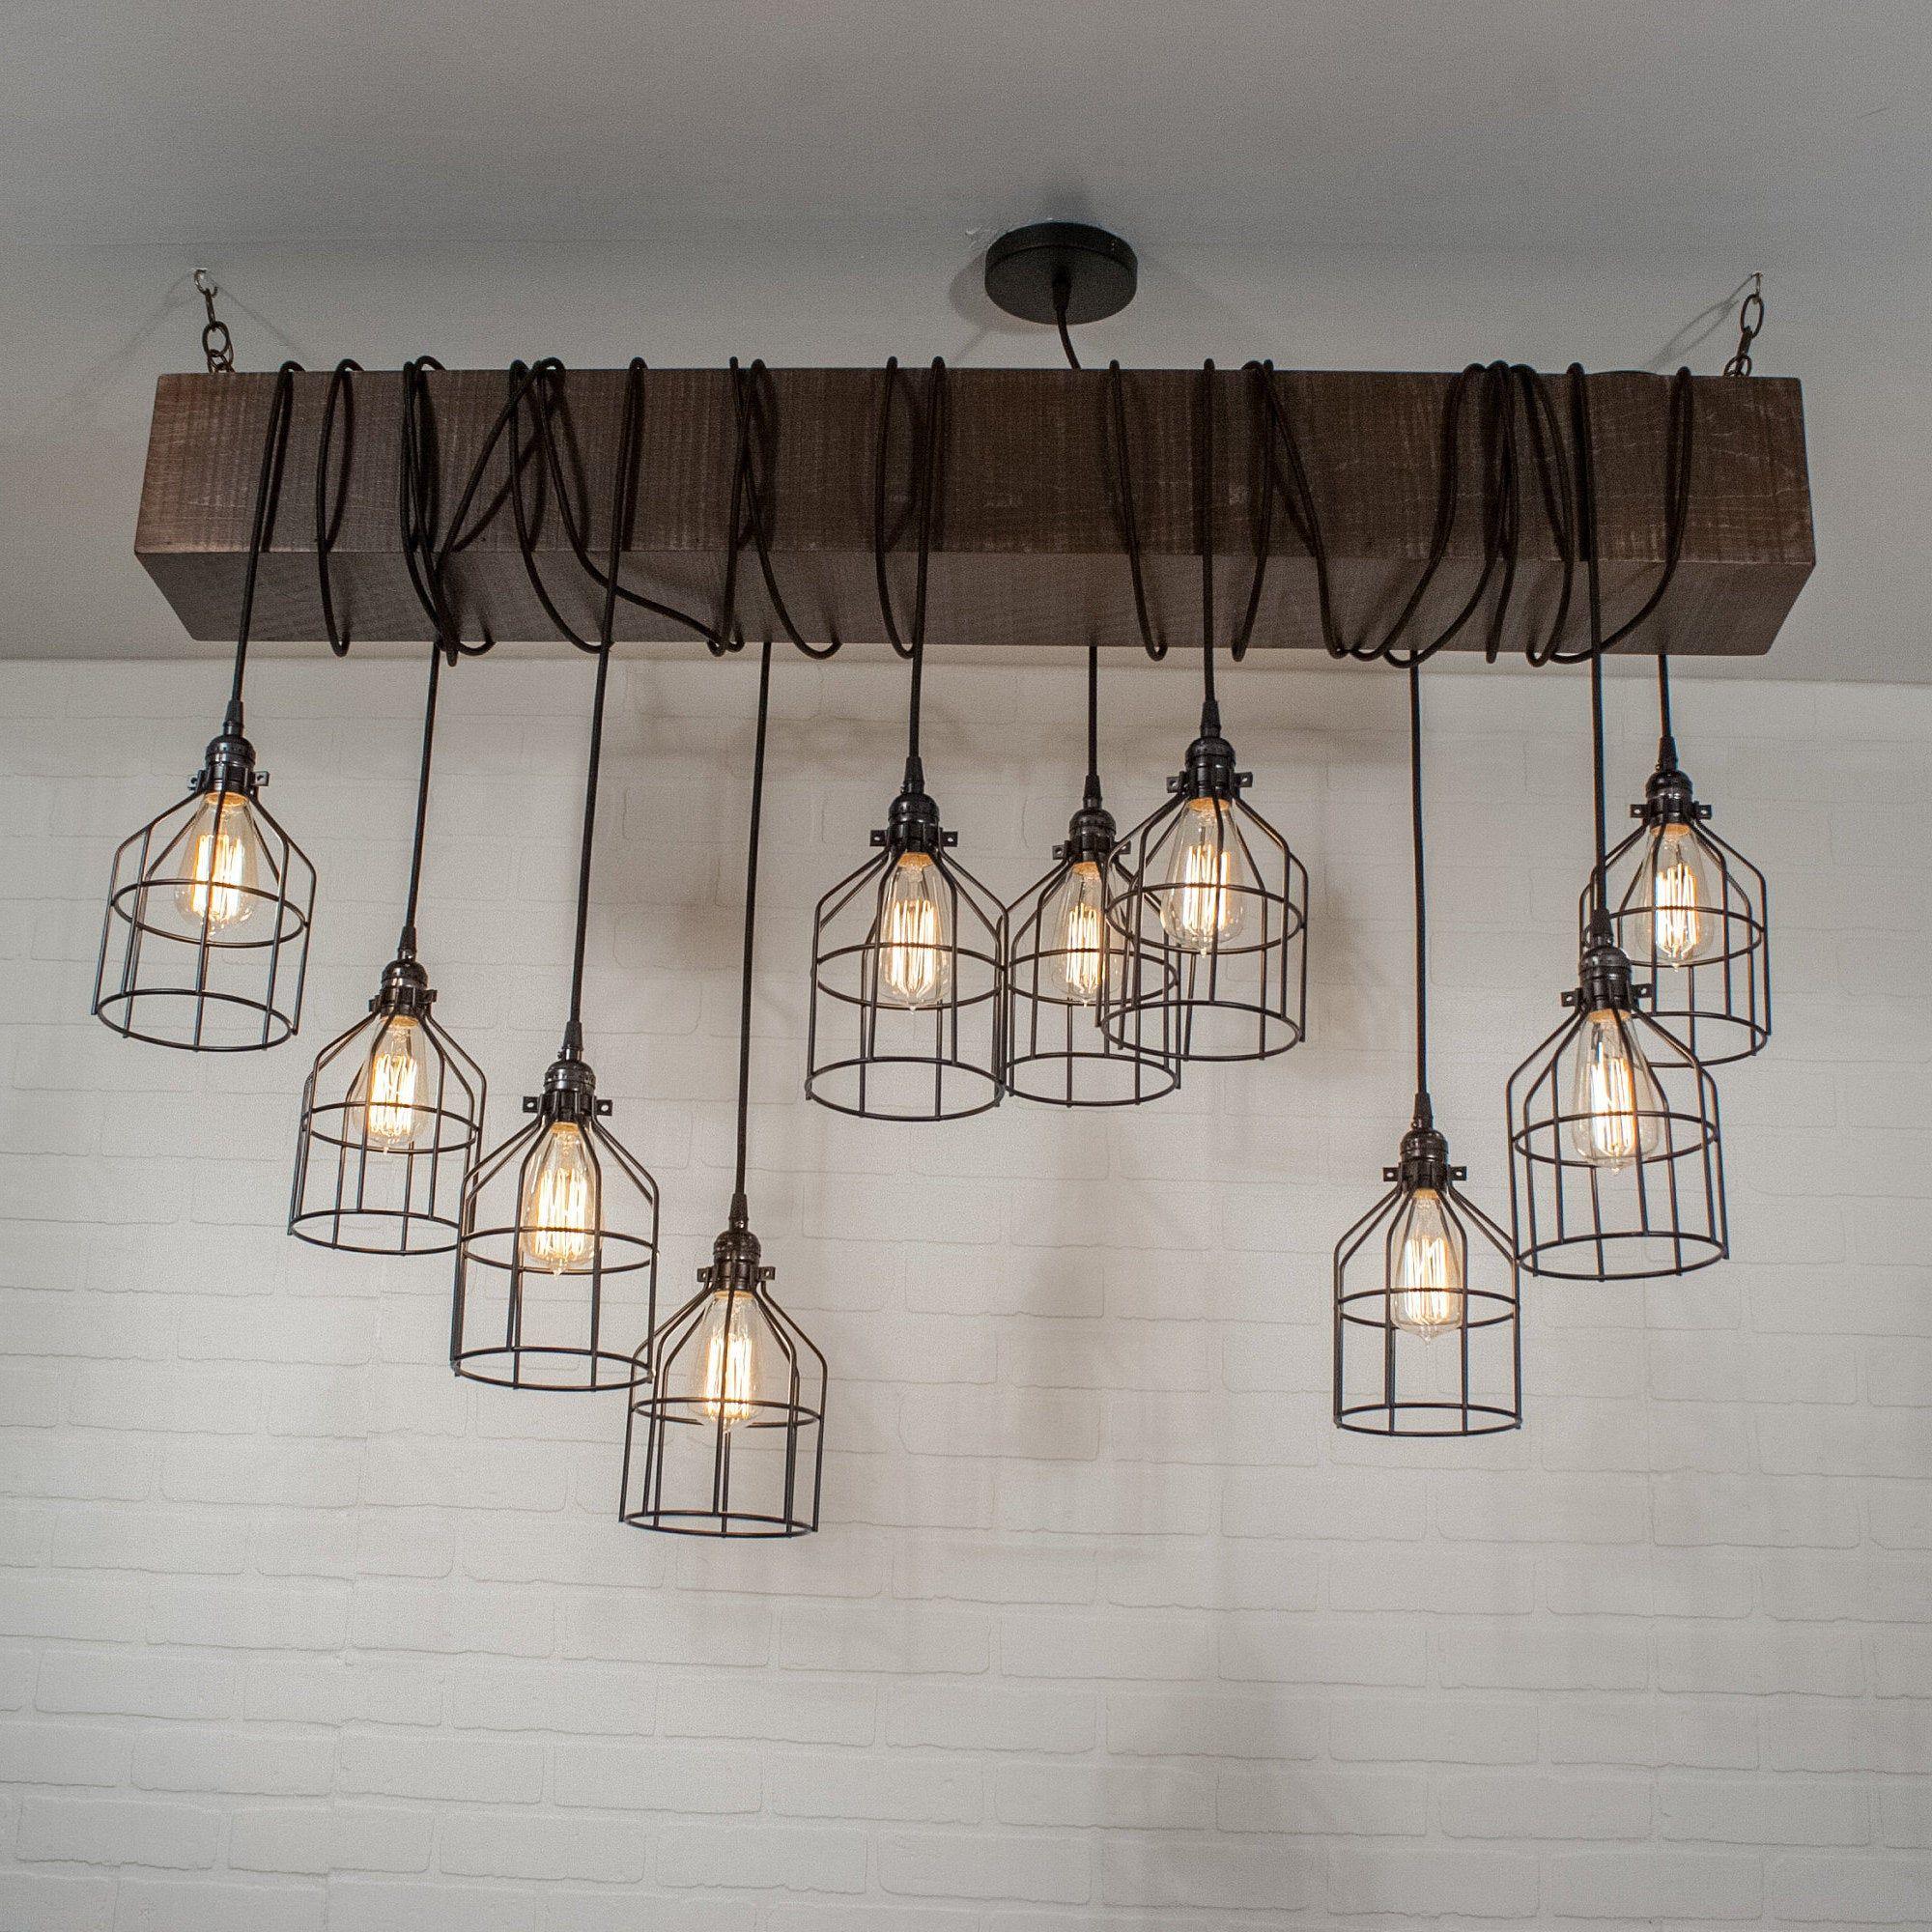 Wood Beam Light Industrial Lighting Fixture 10 Pendant Etsy In 2020 Industrial Light Fixtures Farmhouse Kitchen